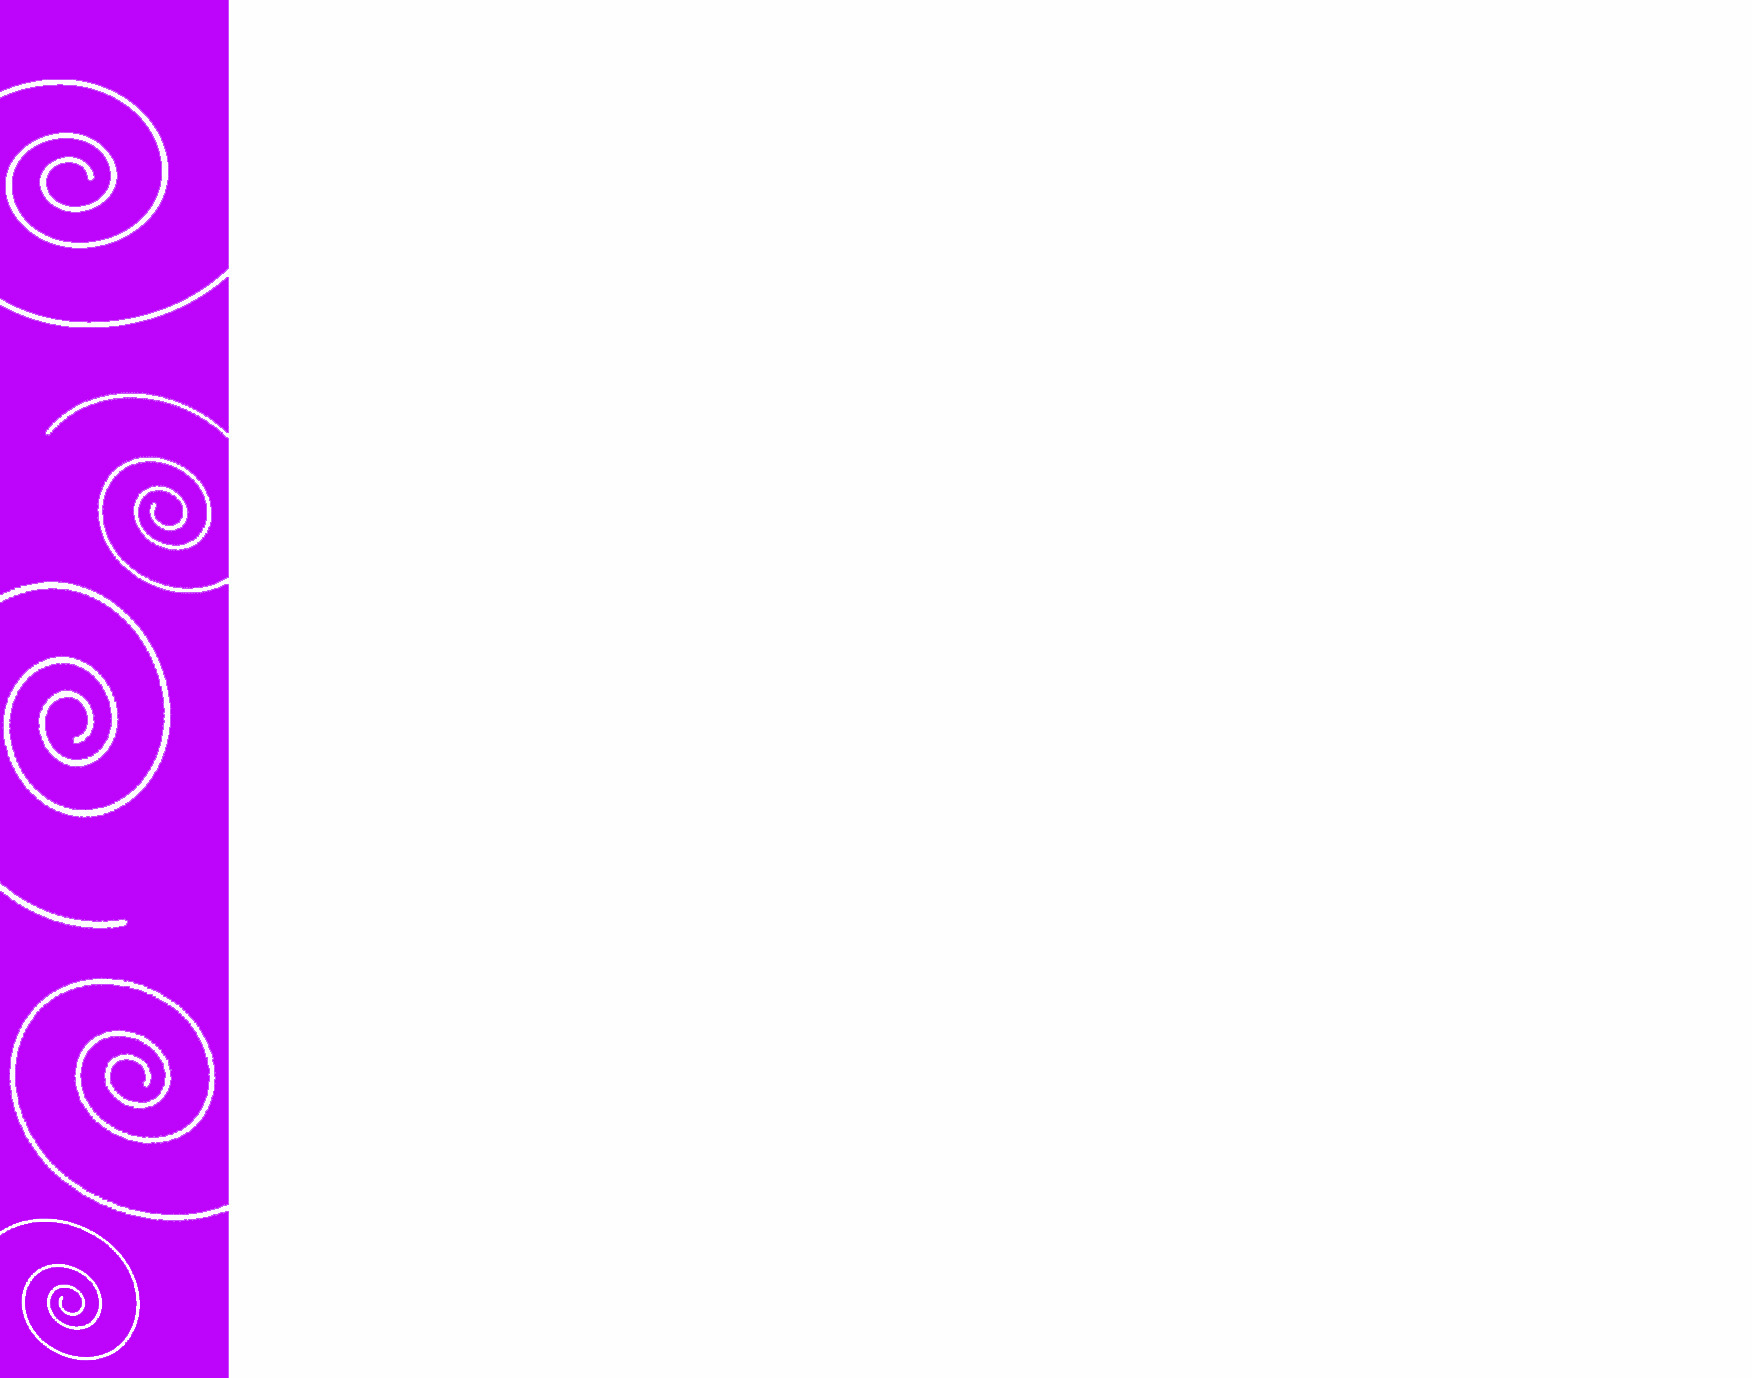 Purple Swirls Border Clipart - Clipart Suggest